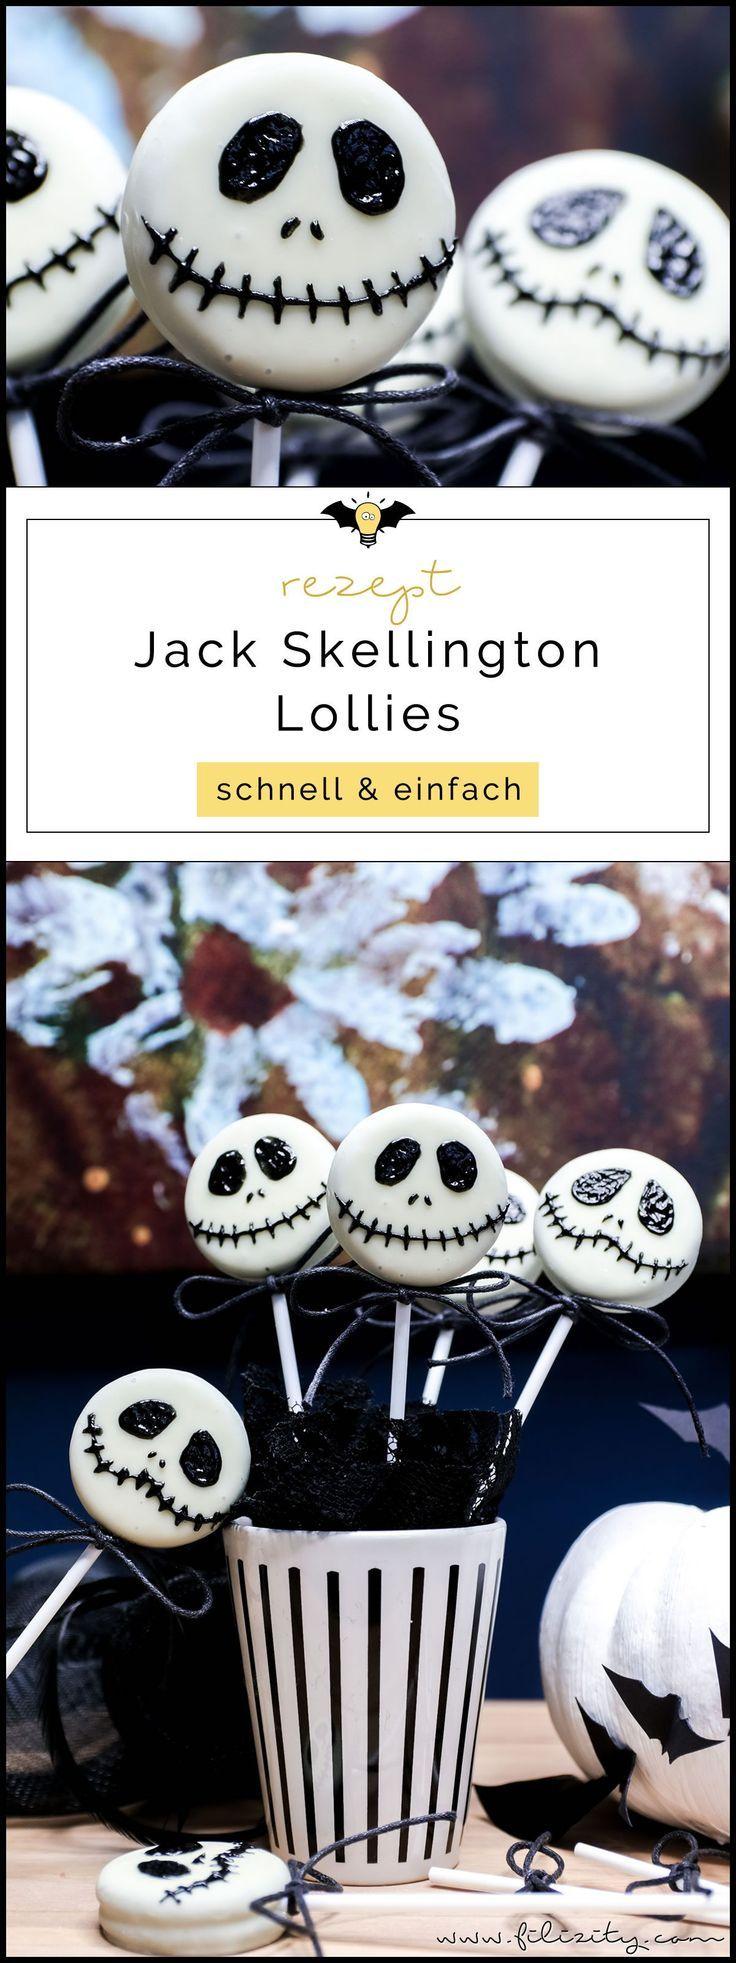 Schnelles Halloween-Rezept: Jack Skellington Keks Lollies | Filizity.com | Food-Blog aus dem Rheinland